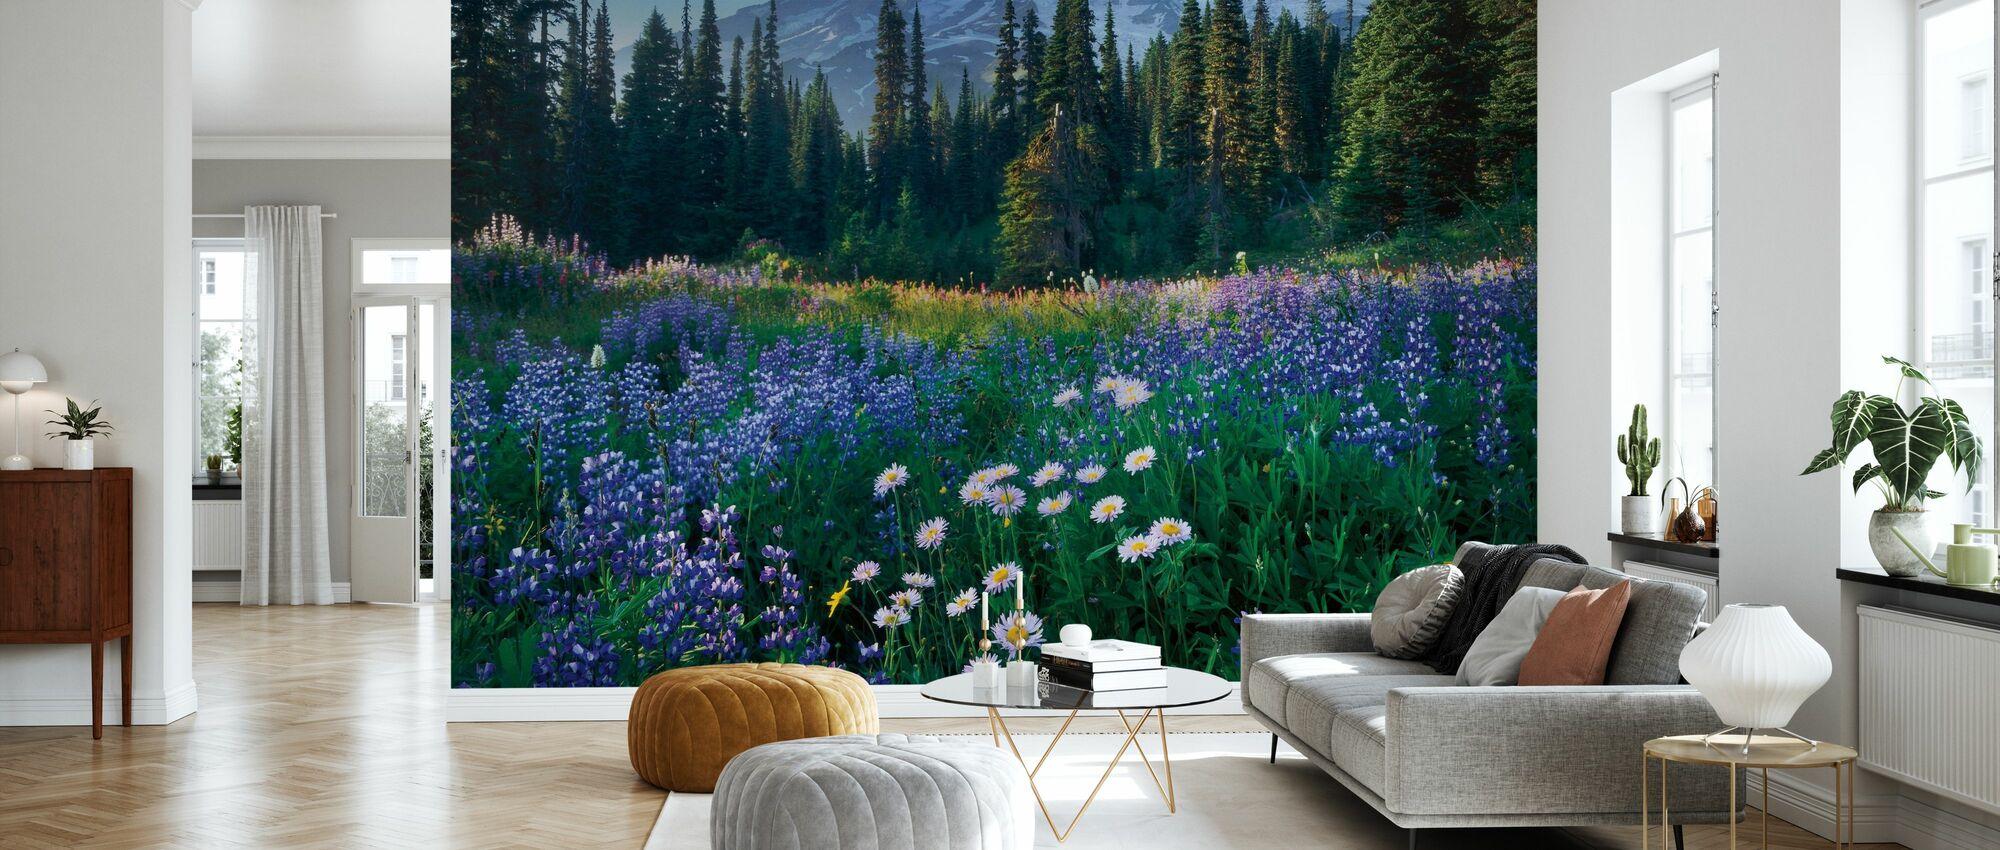 Mount Rainier - Wallpaper - Living Room